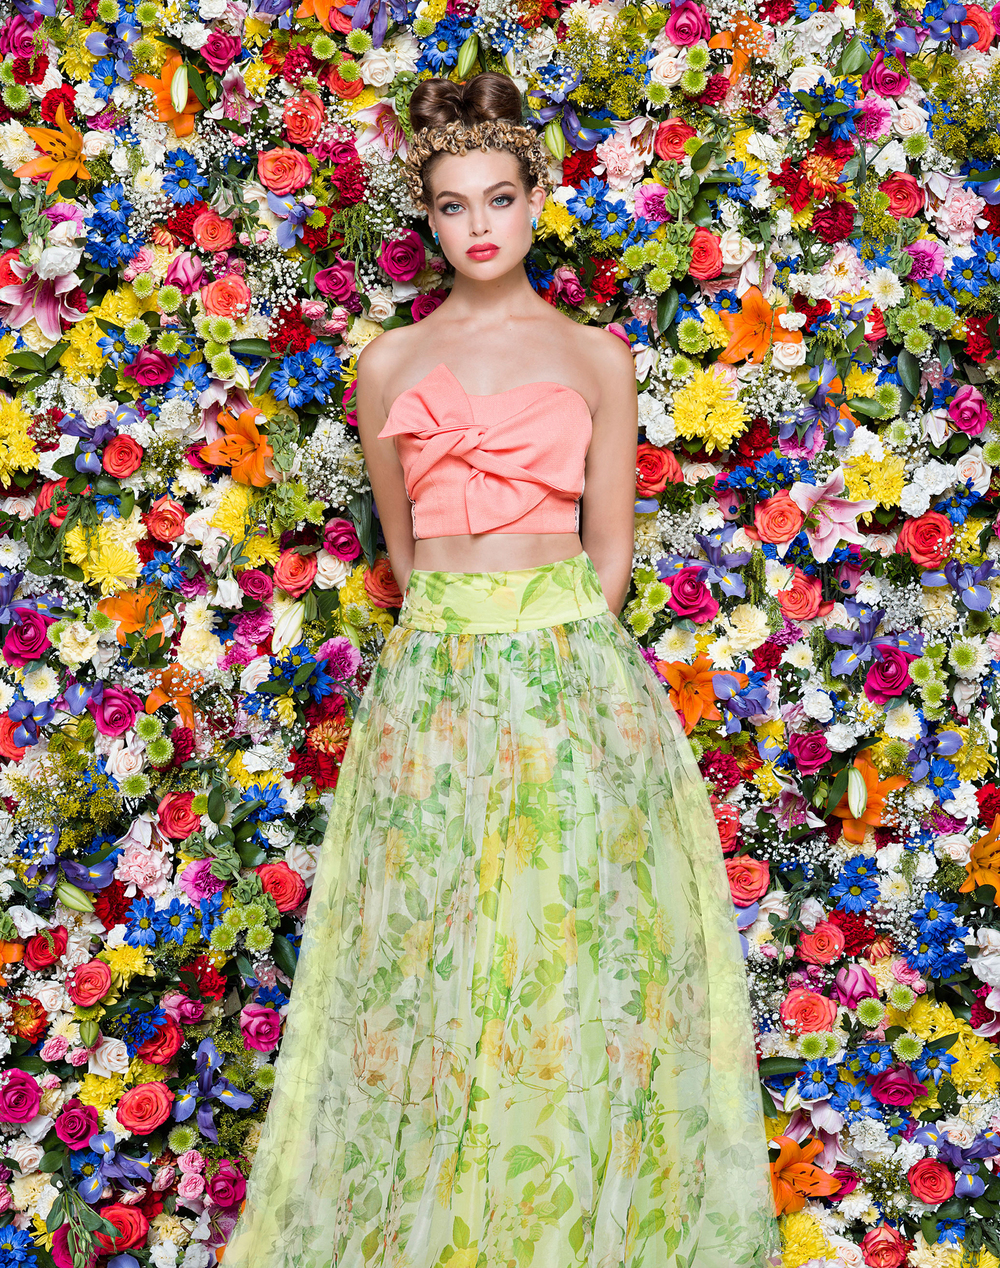 Image retouching for Liquid Fashion Ad Retouching & Compositing at Thomas Canny Studio.jpg